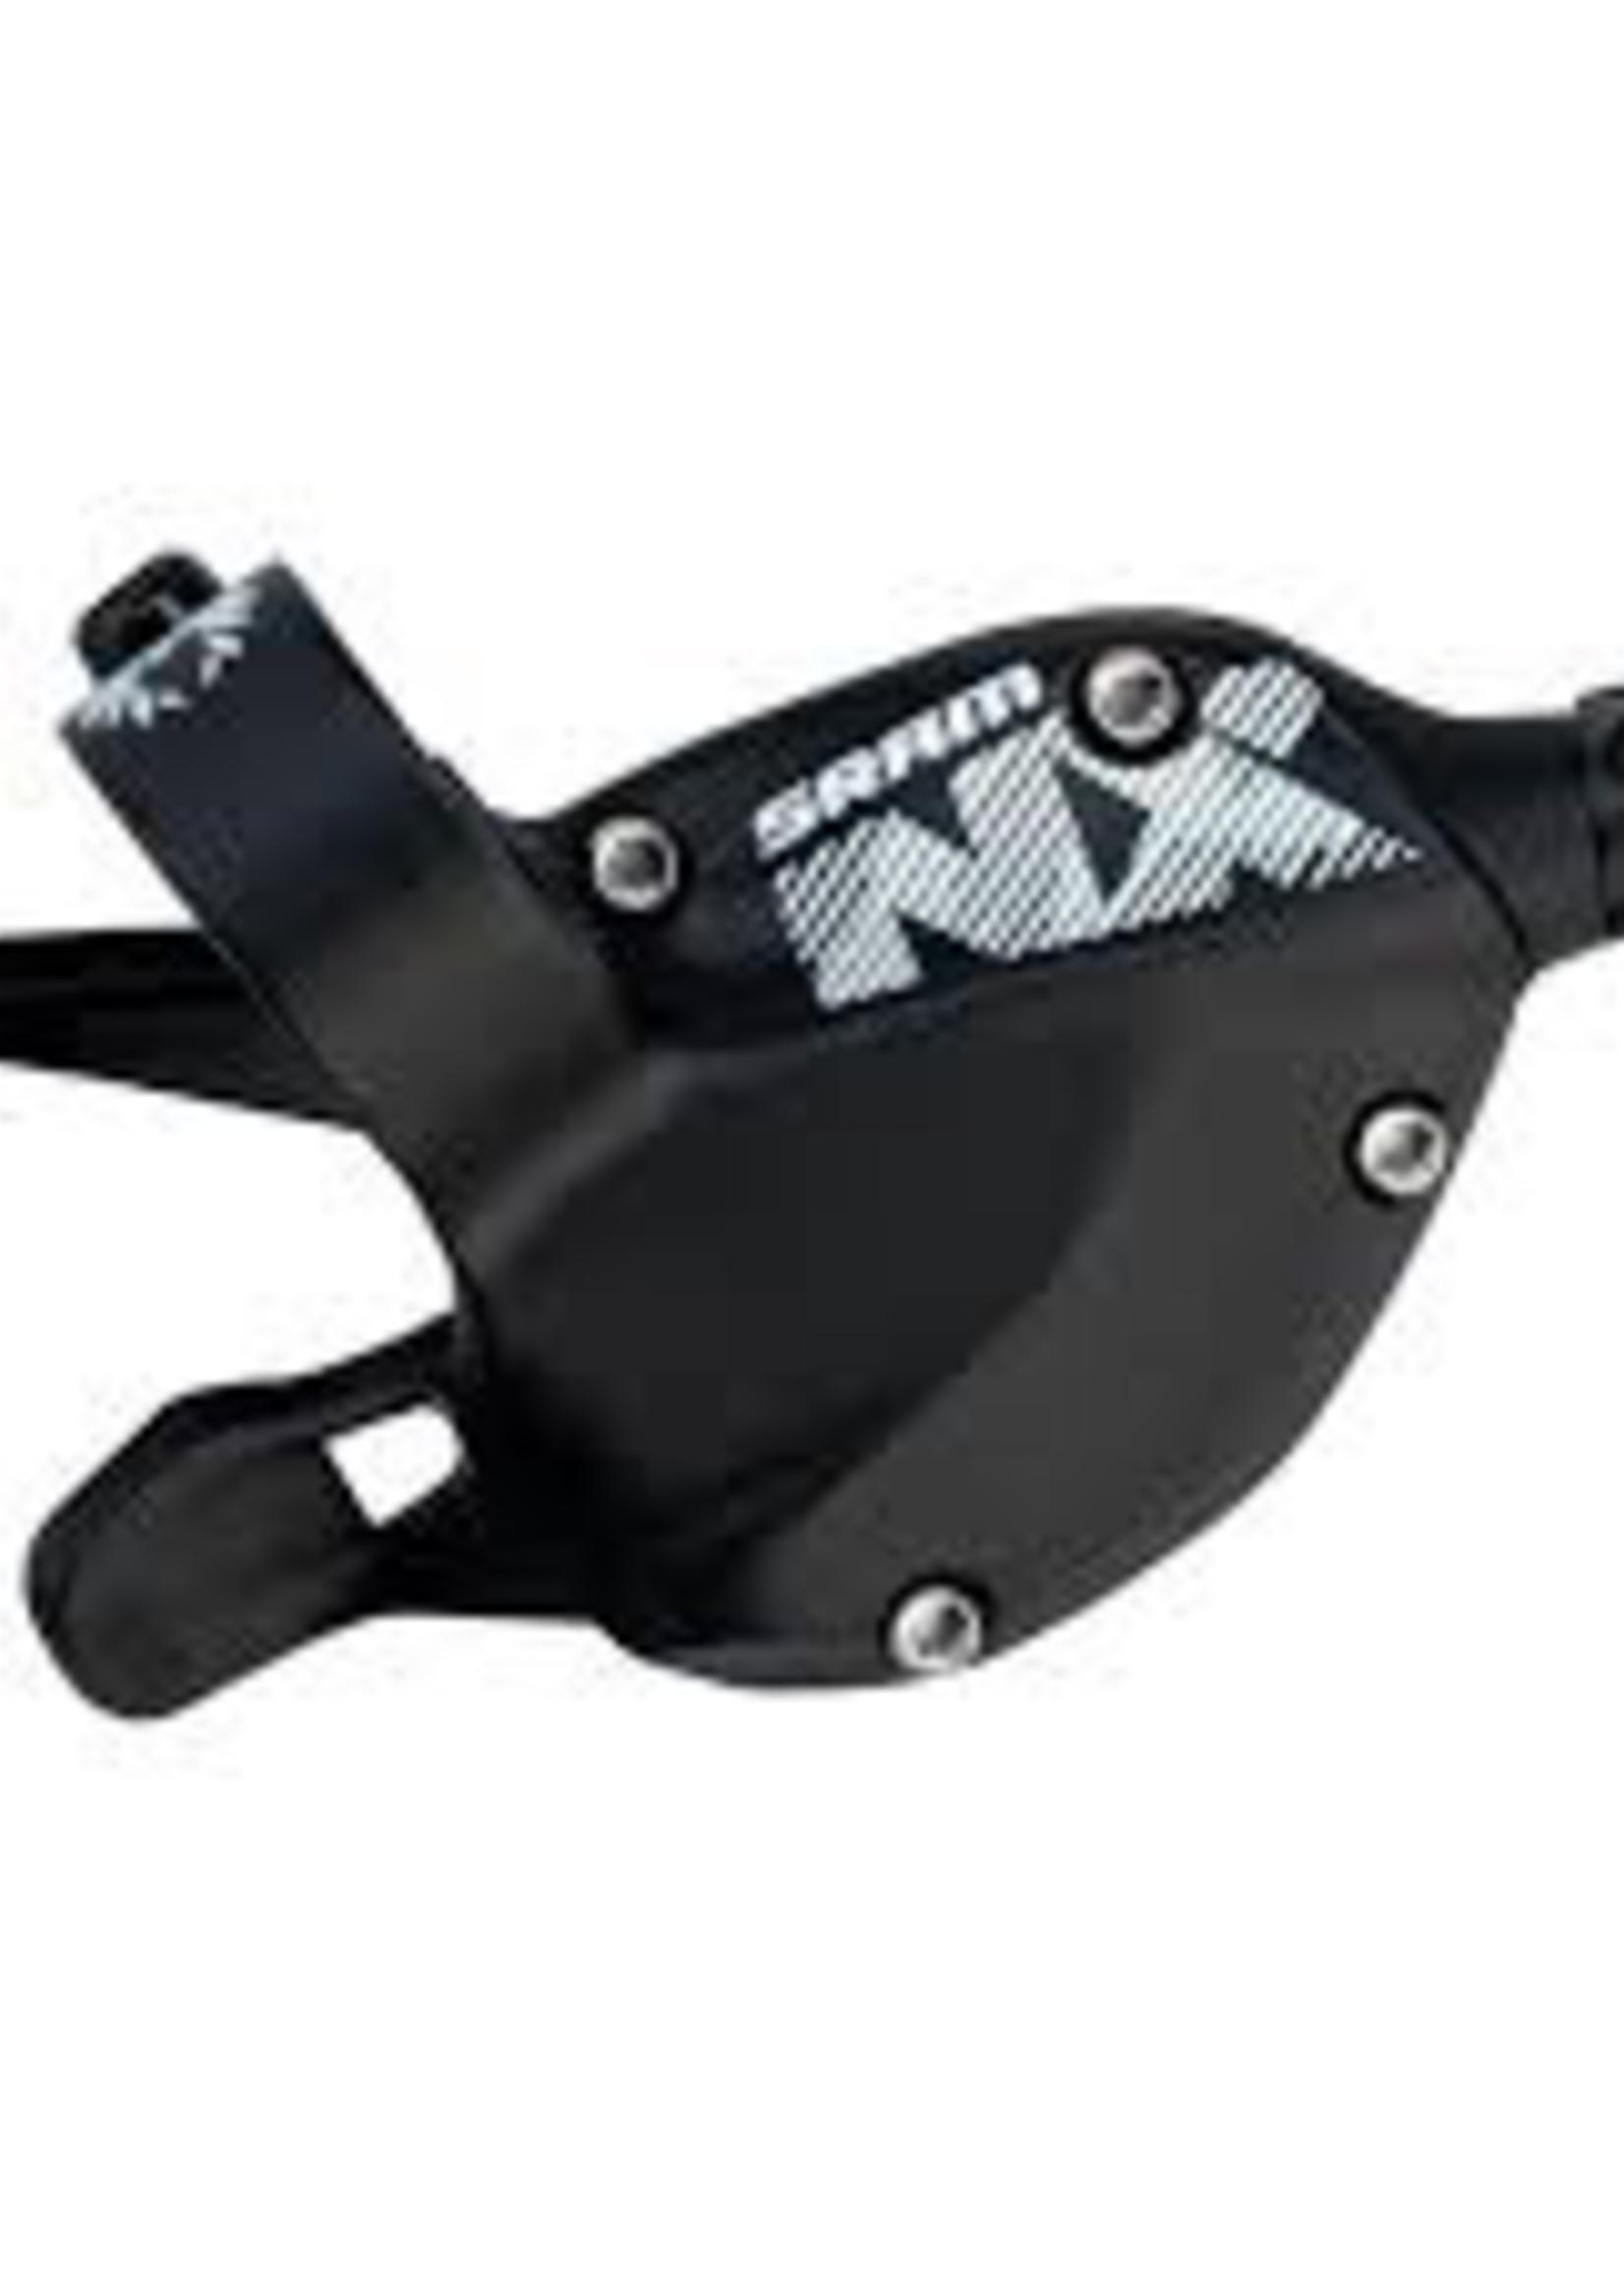 SRAM - NX EAGLE 12 SPEED SHIFTER